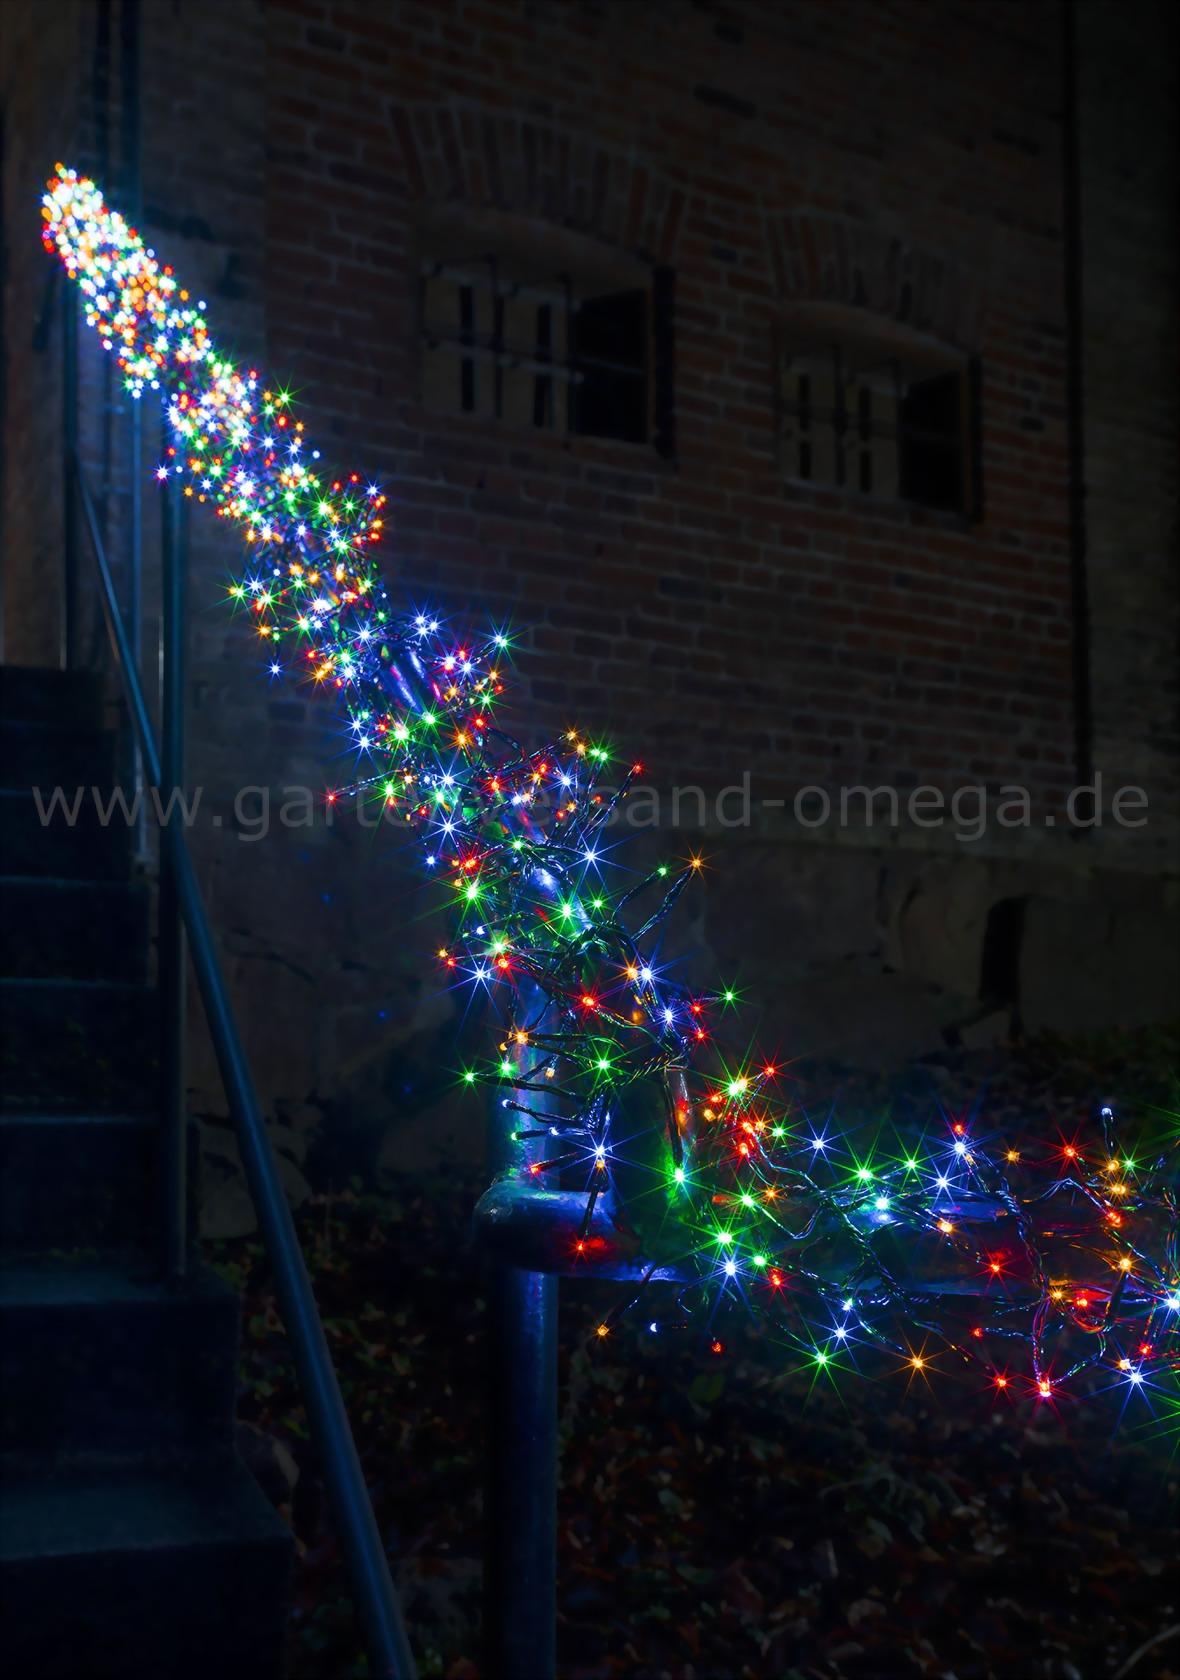 mikro led cluster lichterkette bunt b schellichterkette. Black Bedroom Furniture Sets. Home Design Ideas